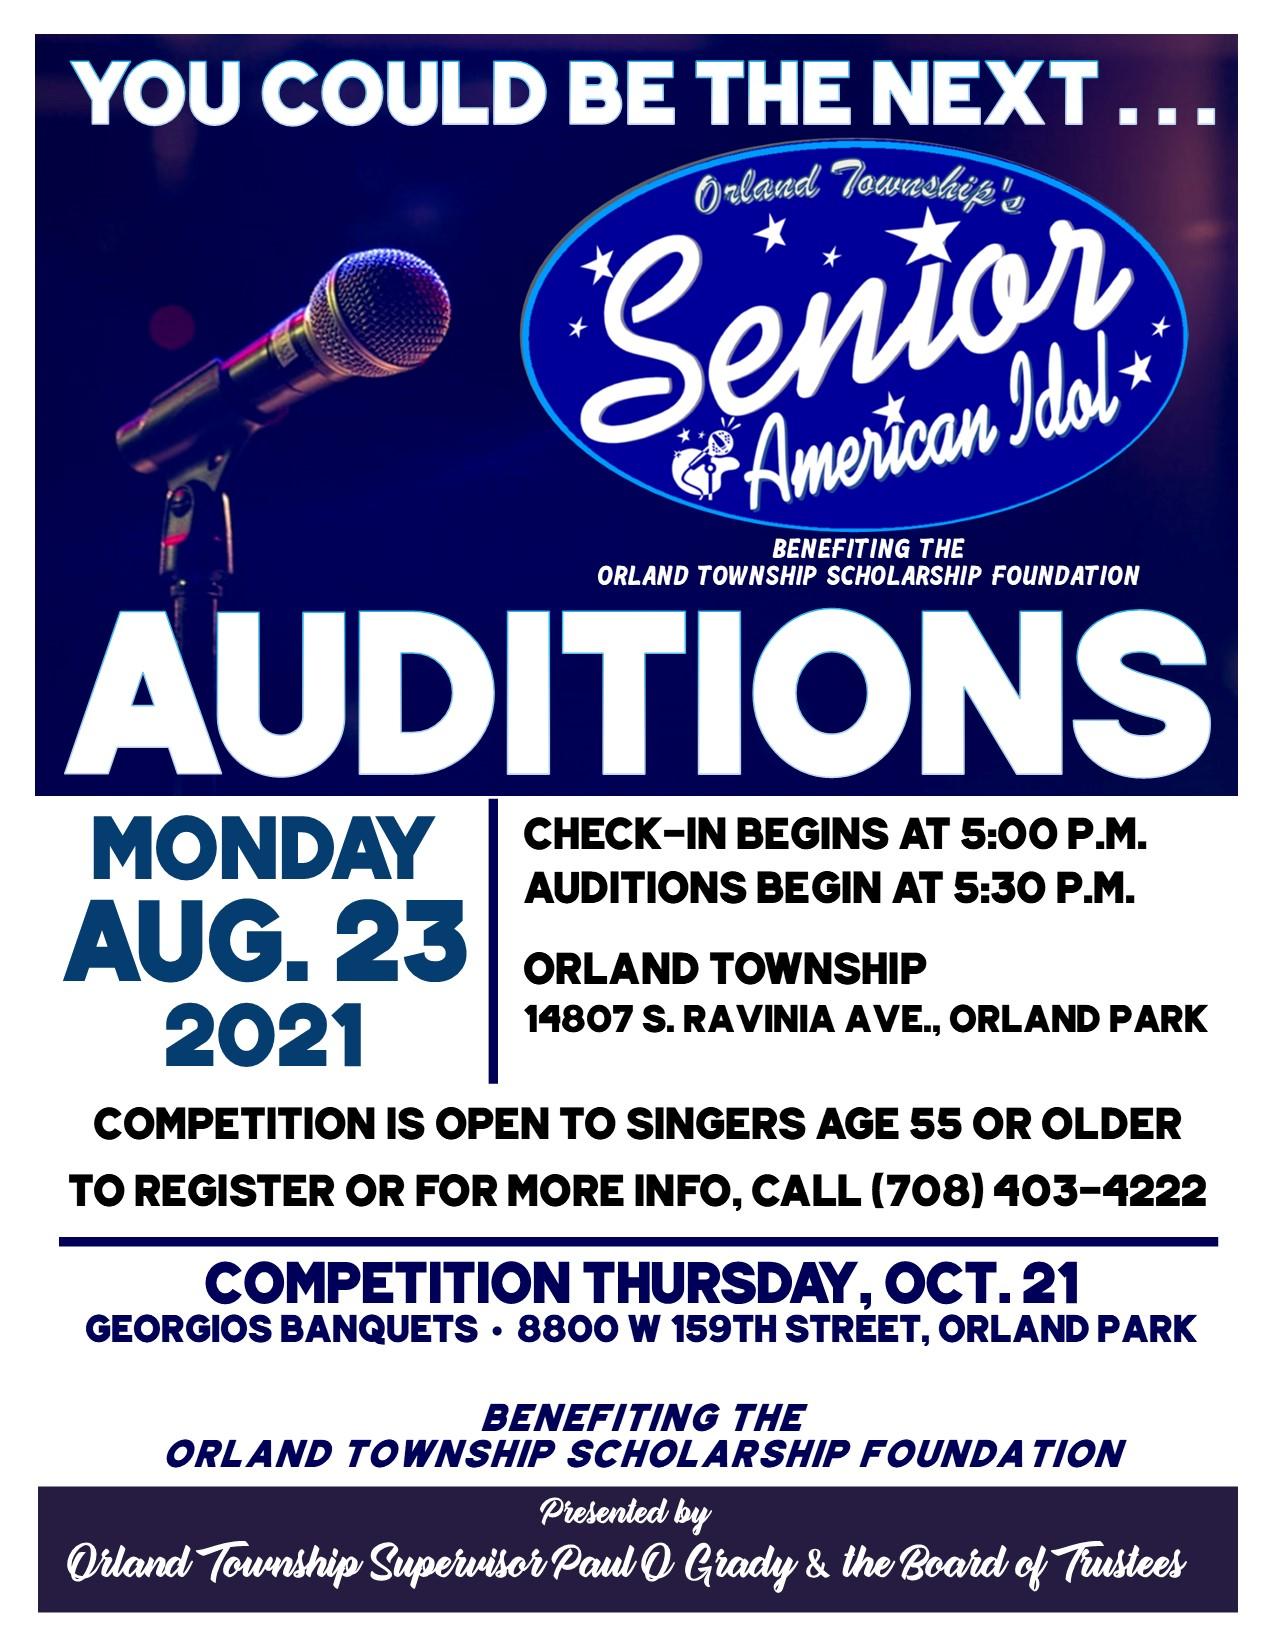 Orland Township Senior American Idol